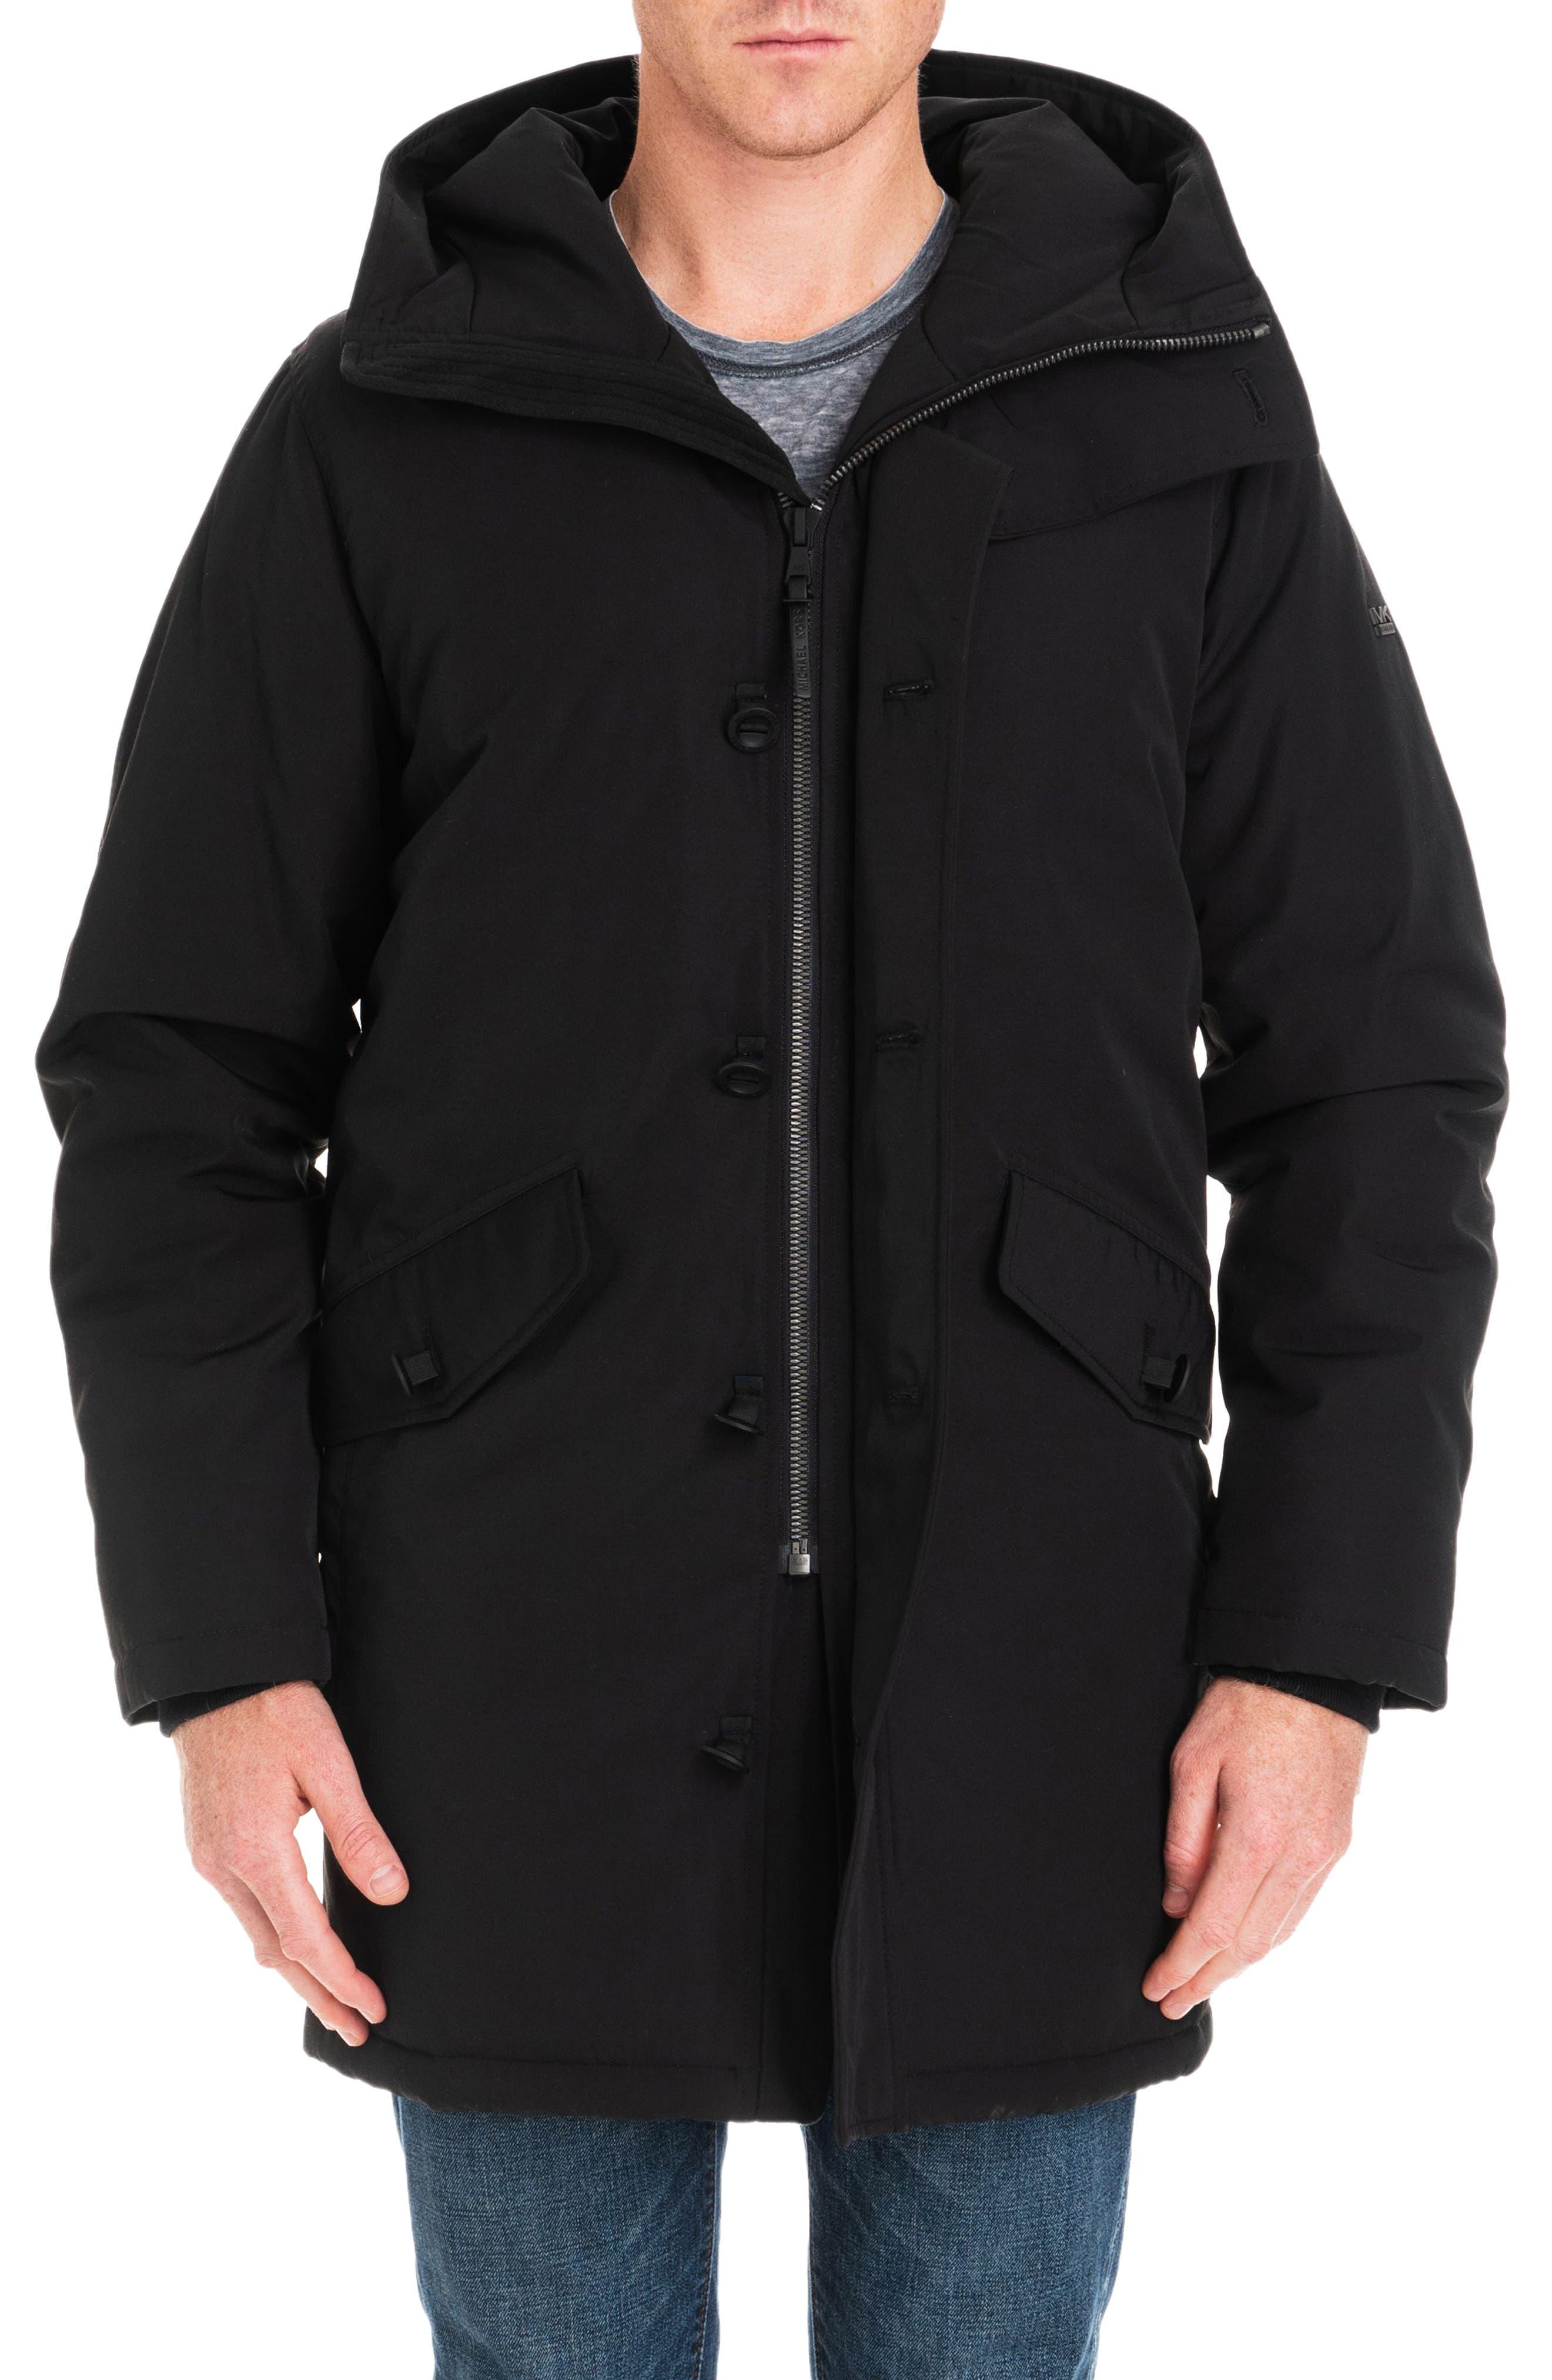 Gardiner Water Resistant Snorkel Coat,                             Alternate thumbnail 6, color,                             BLACK/ MIDNIGHT